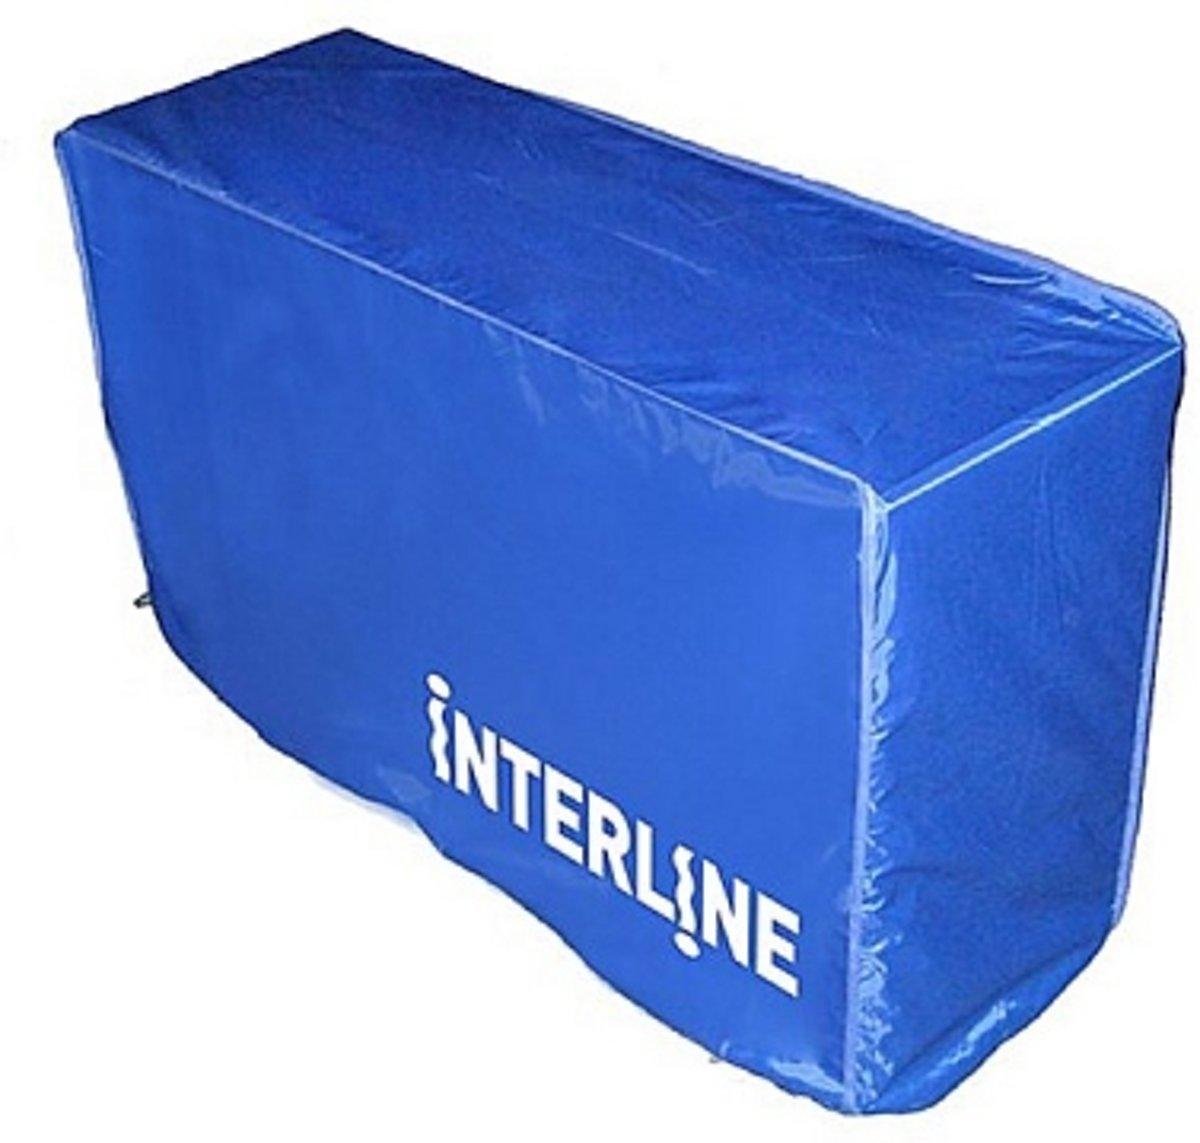 Interline Warmtepomphoesvoor 3.6 kW Warmtepompen